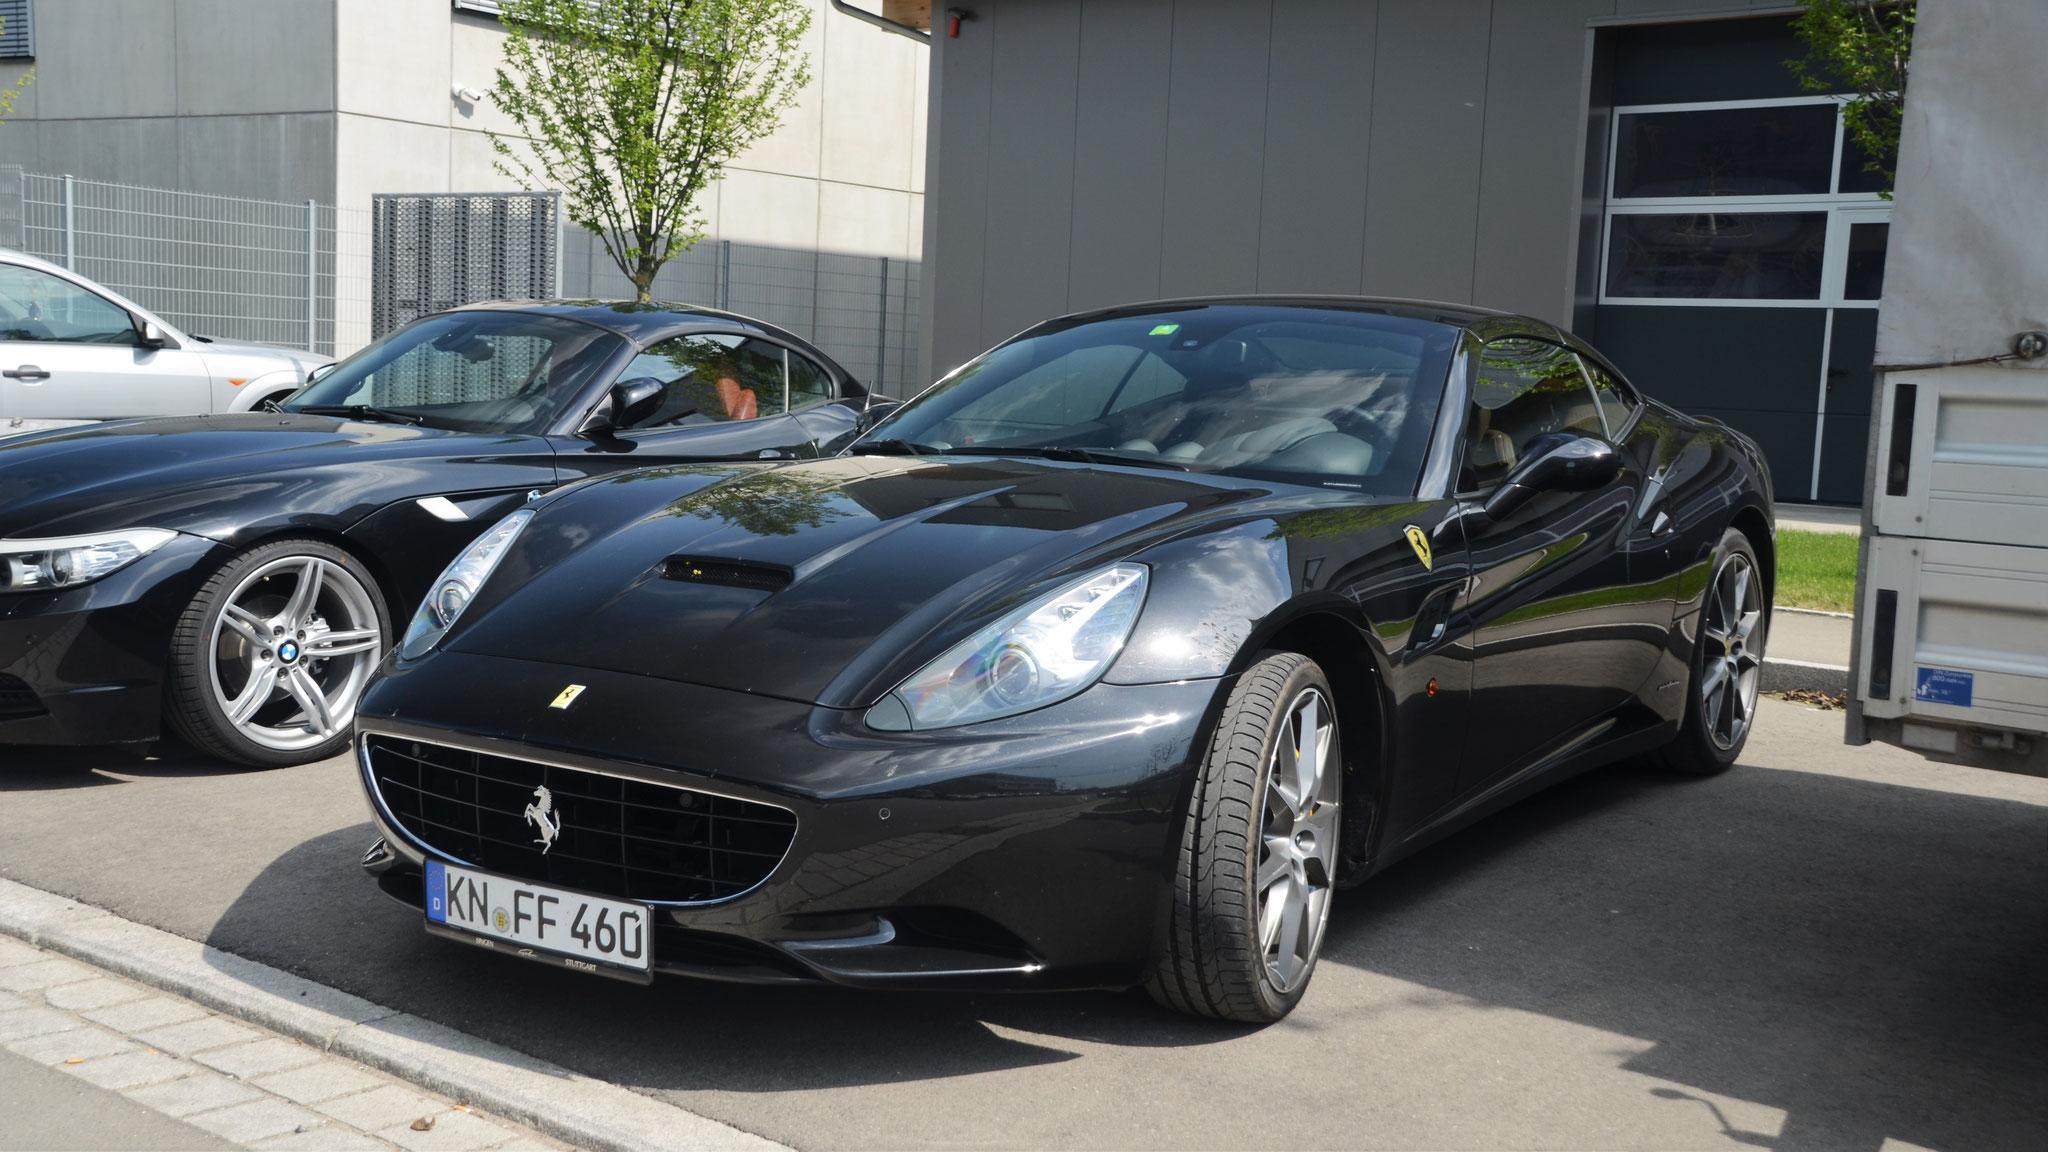 Ferrari California - KN-FF-460